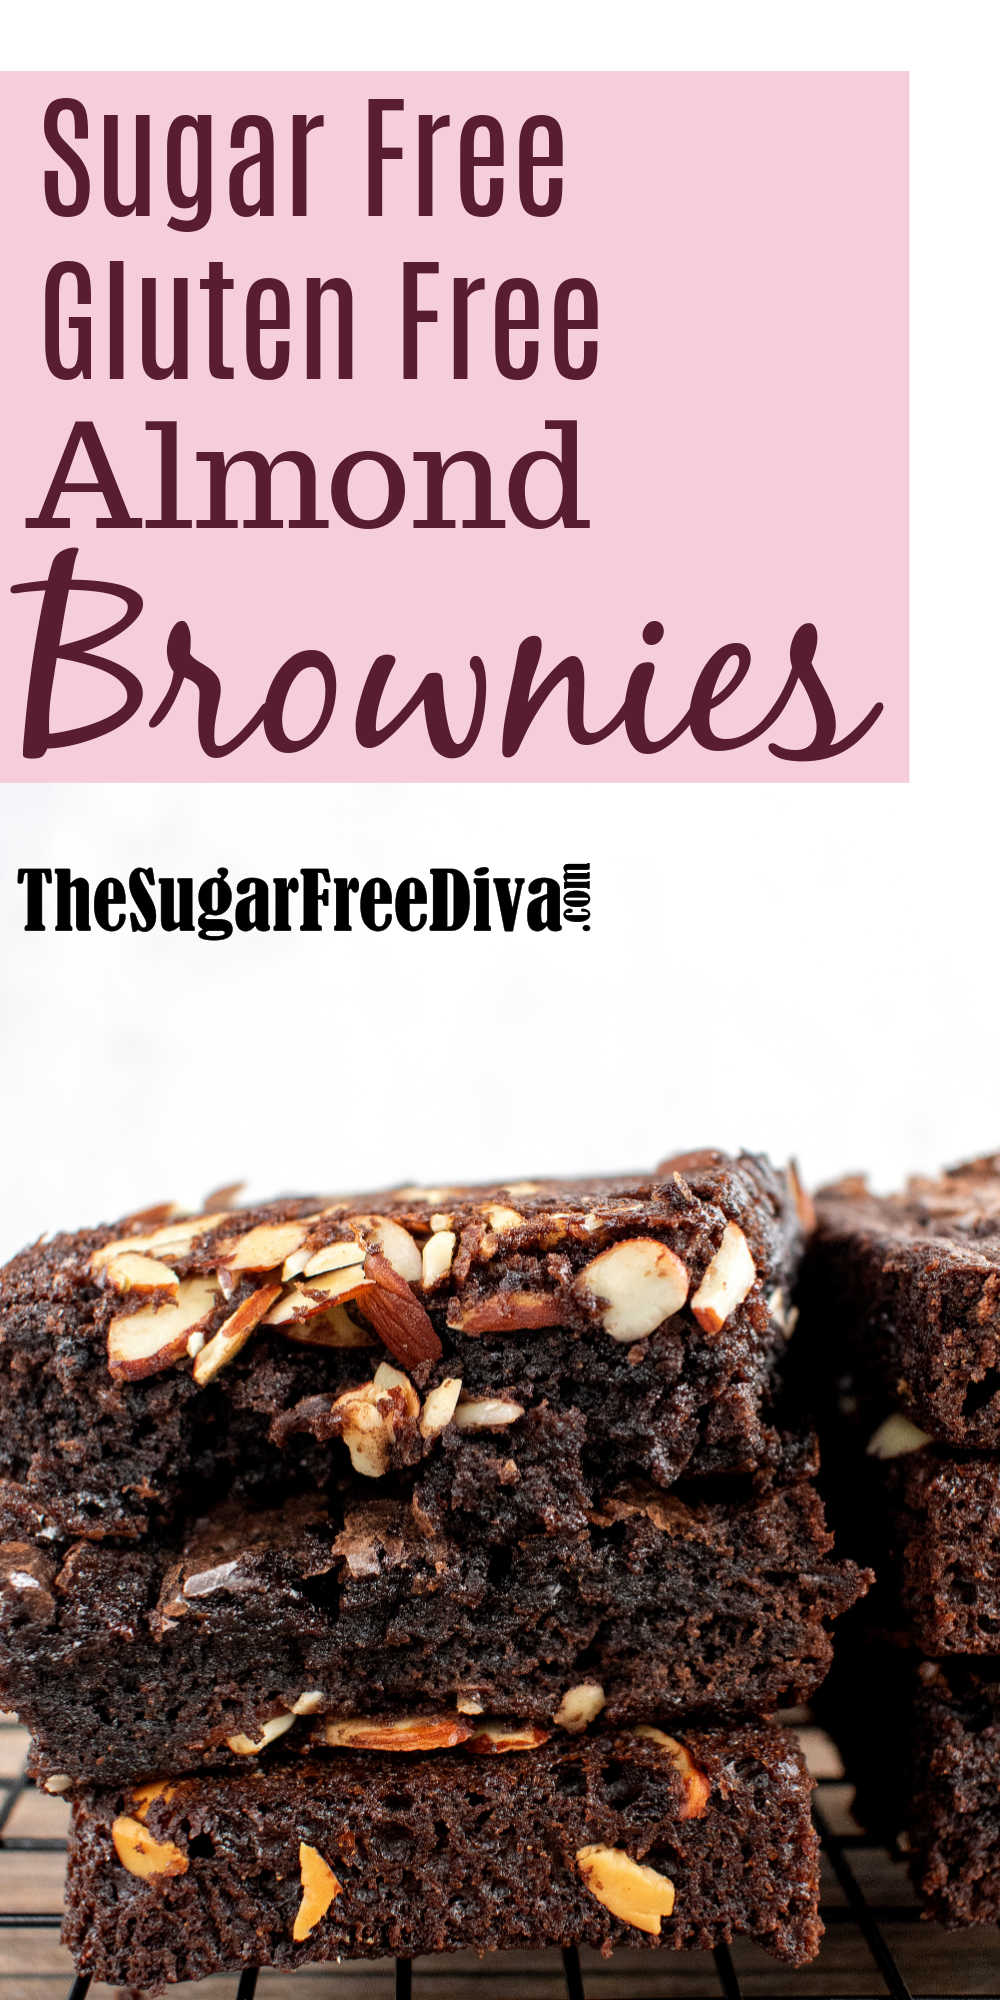 Sugar Free Gluten Free Almond Brownies